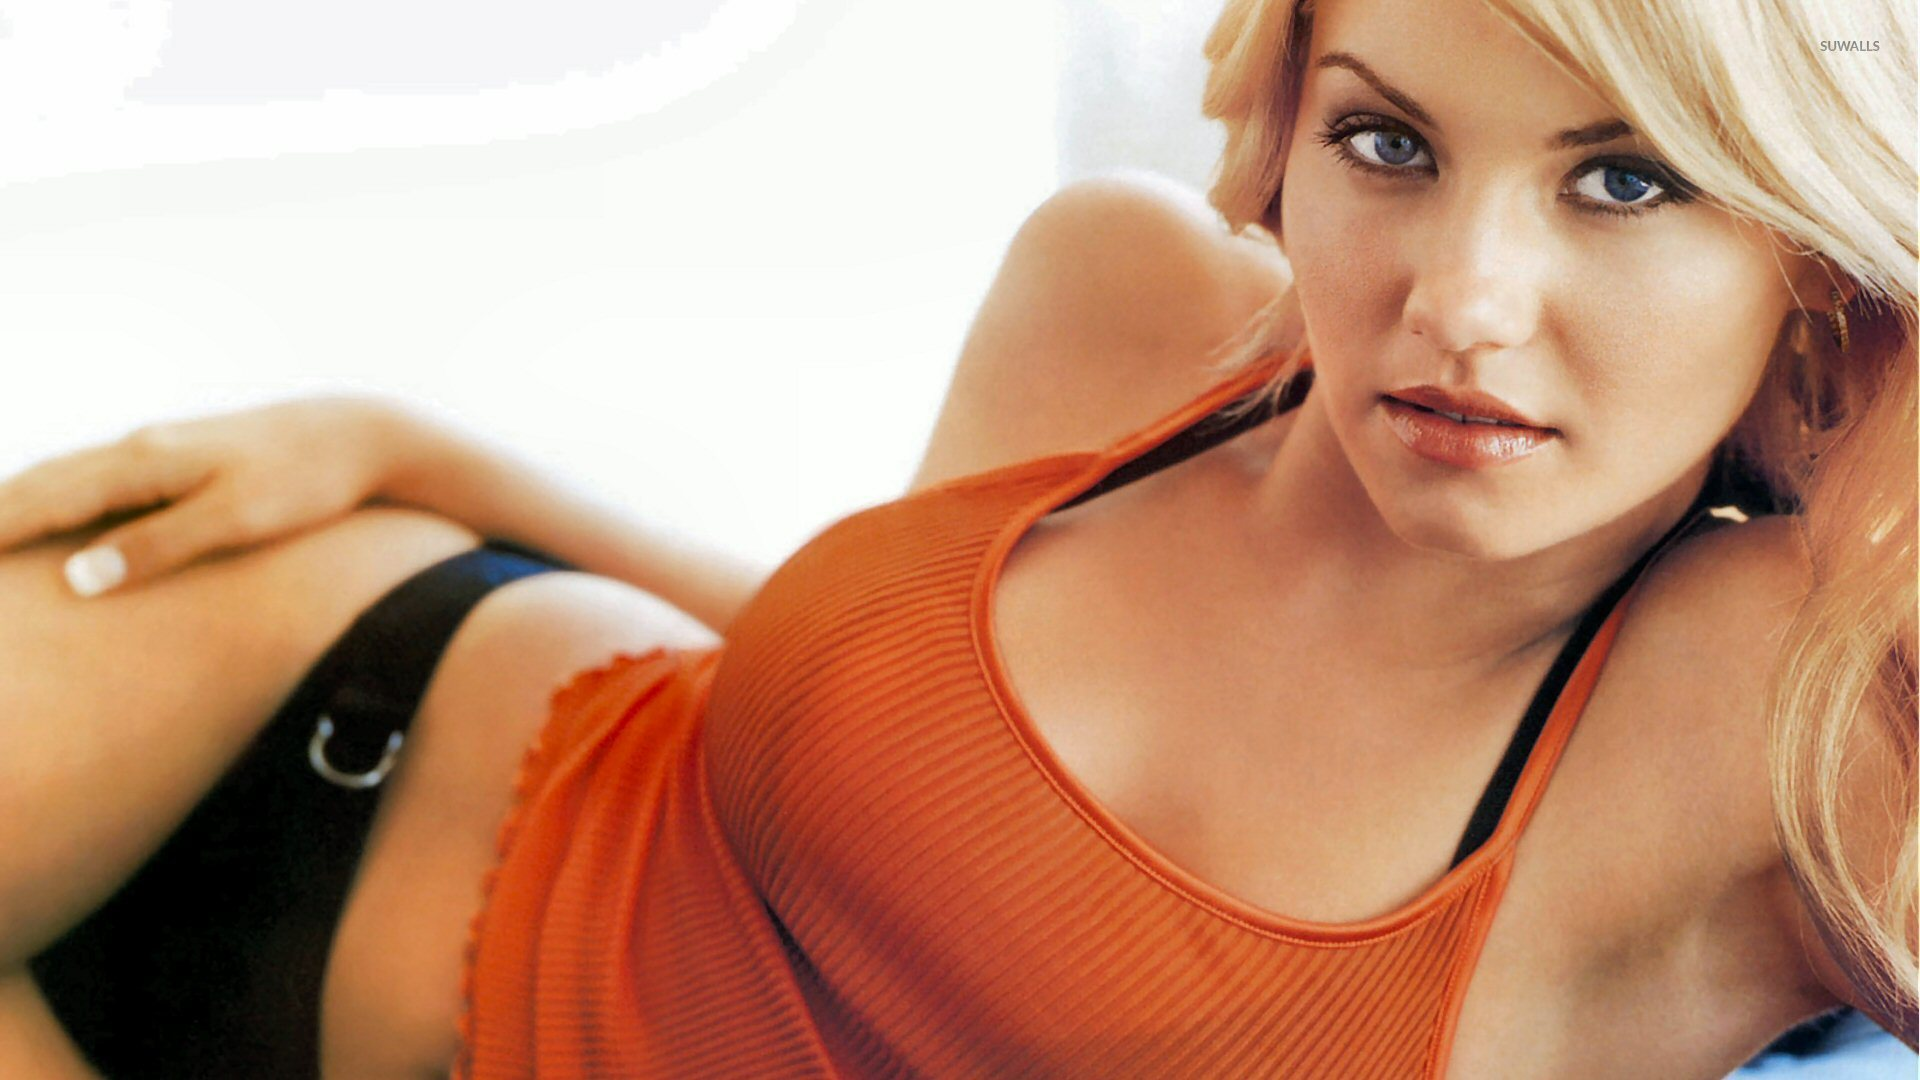 elisha cuthbert celebrity screensaver - photo #17